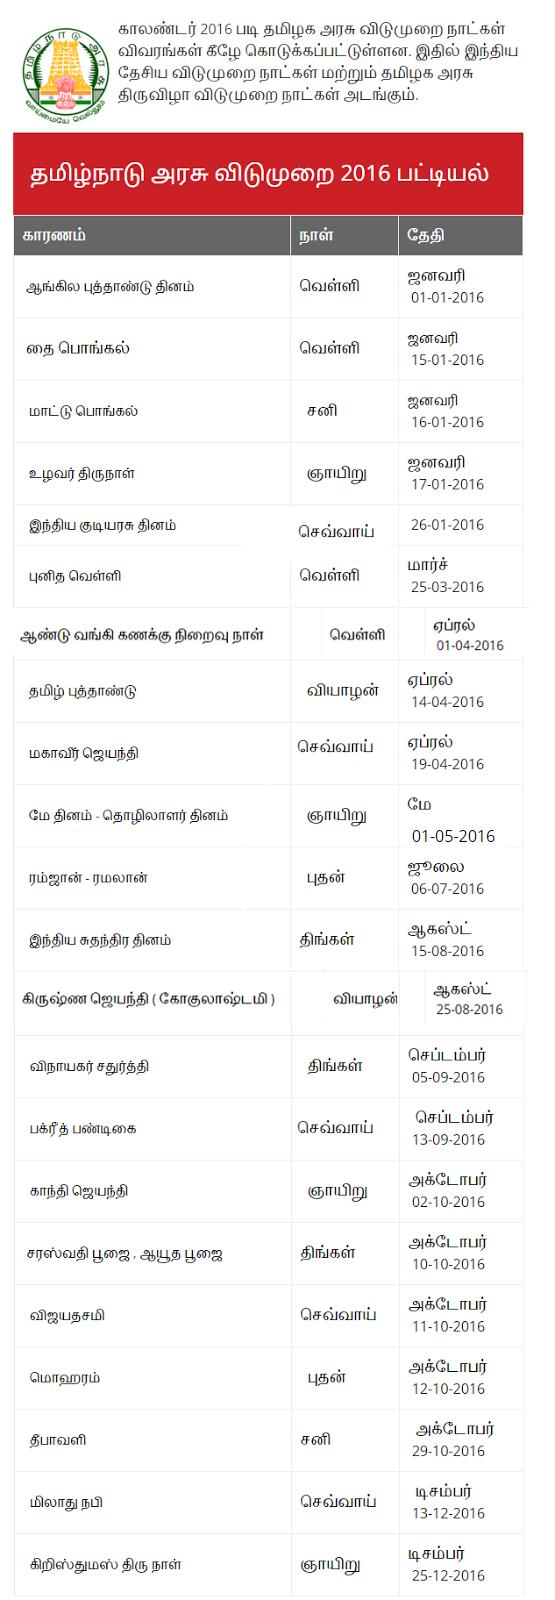 Tamil Nadu Government holidays 2016 List